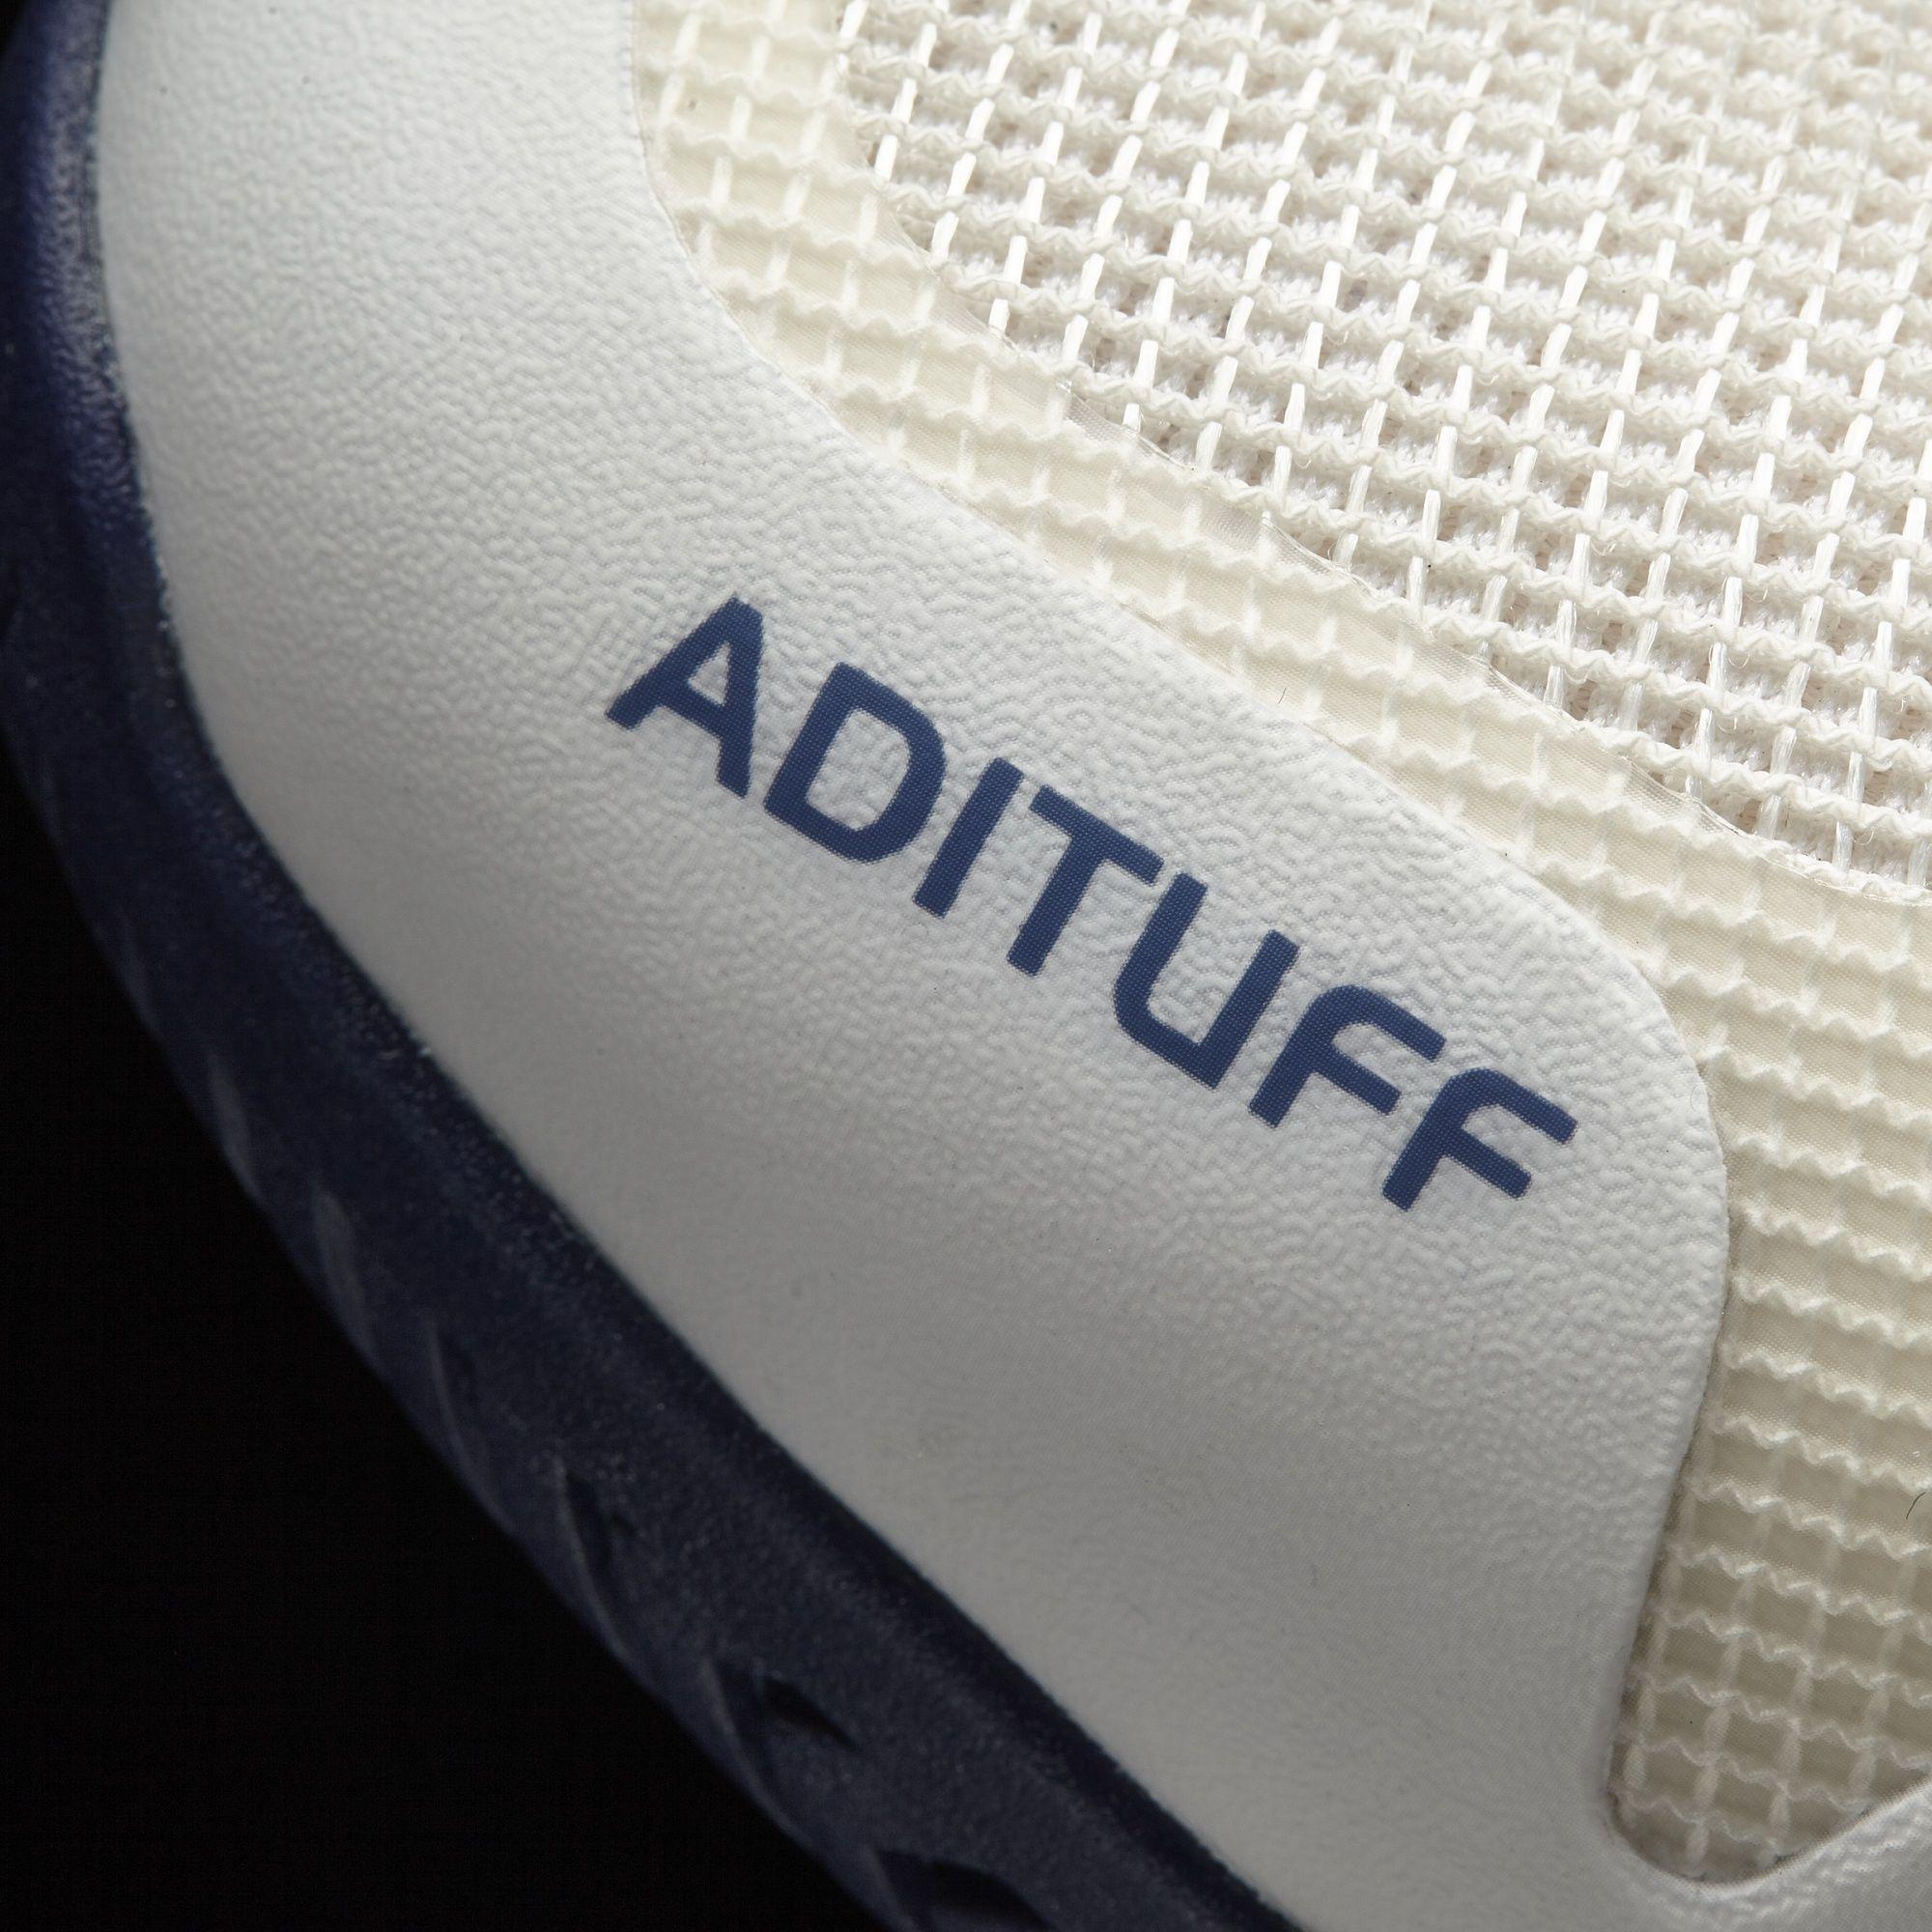 a92efb6d68fc5 Adidas Mens Adizero Ubersonic 2.0 Pharrell Williams Tennis Shoes -  Multi-Colour